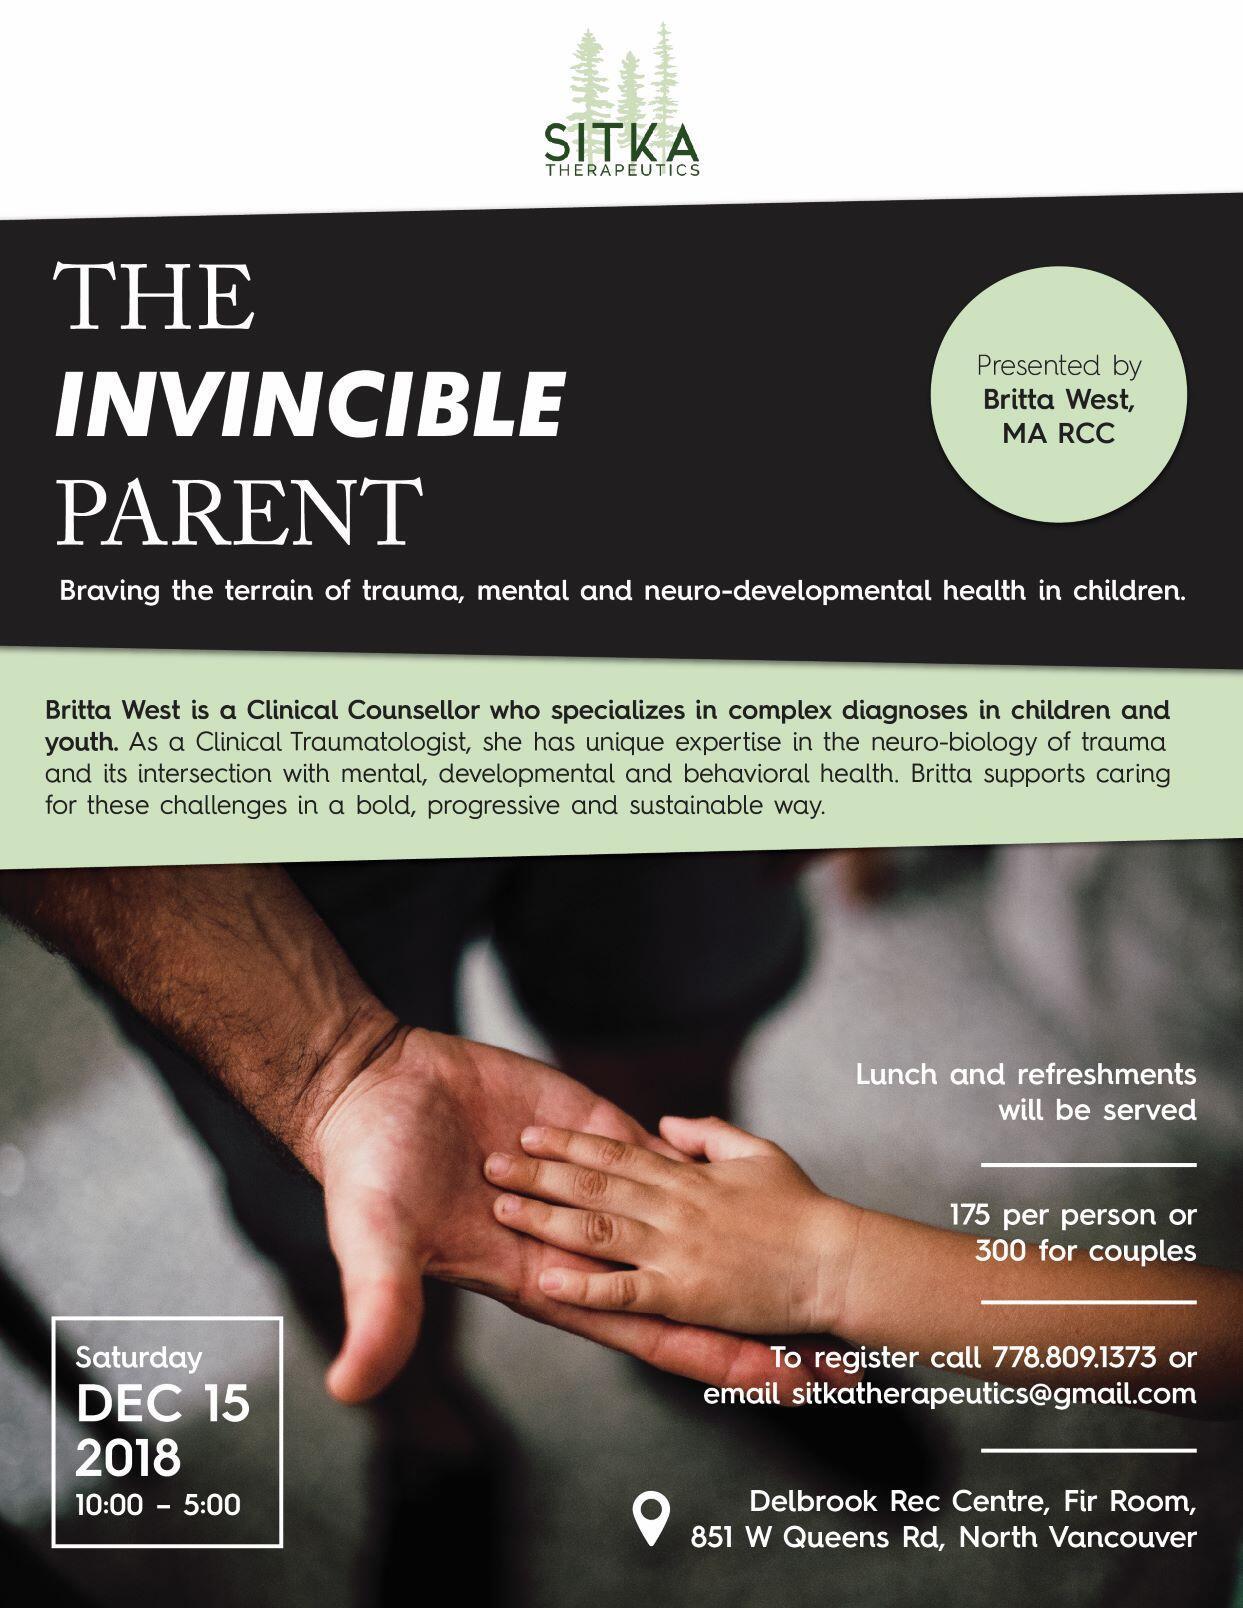 THE INVINCIBLE PARENT